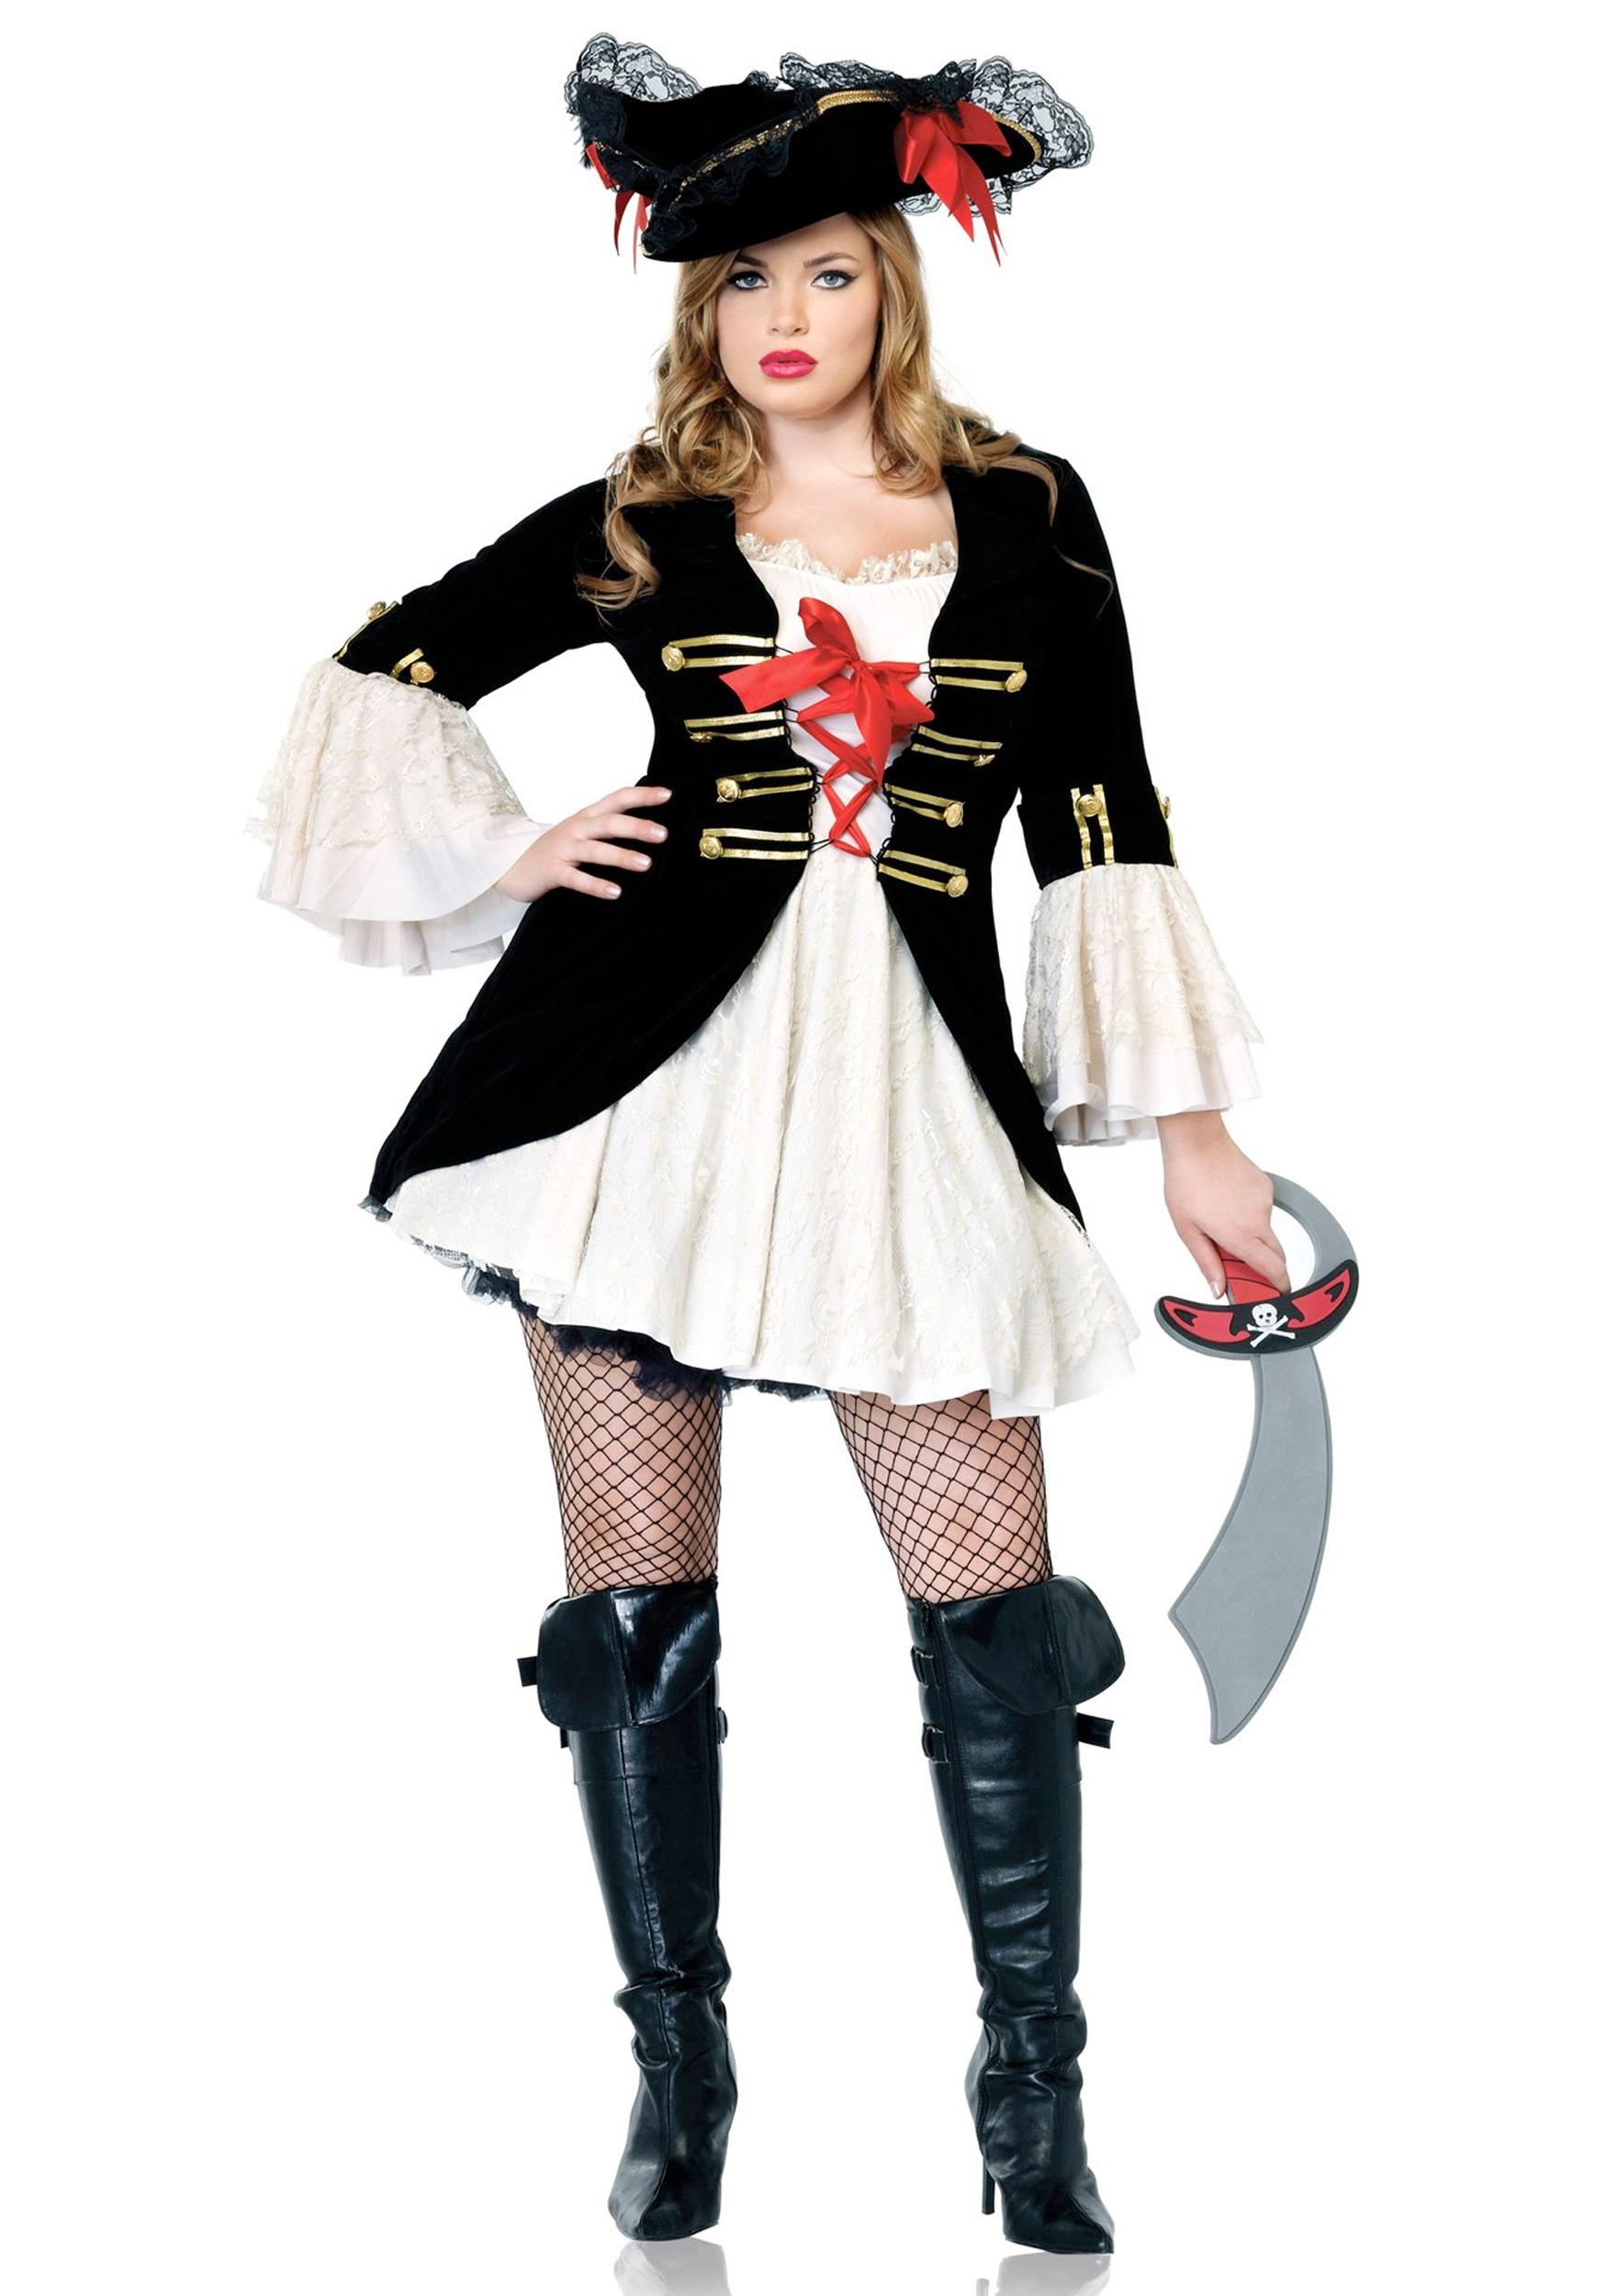 Plus Size Sexy Captain Swashbuckler Costume  sc 1 st  Halloween Costumes & Plus Size Sexy Captain Swashbuckler Costume - Halloween Costumes